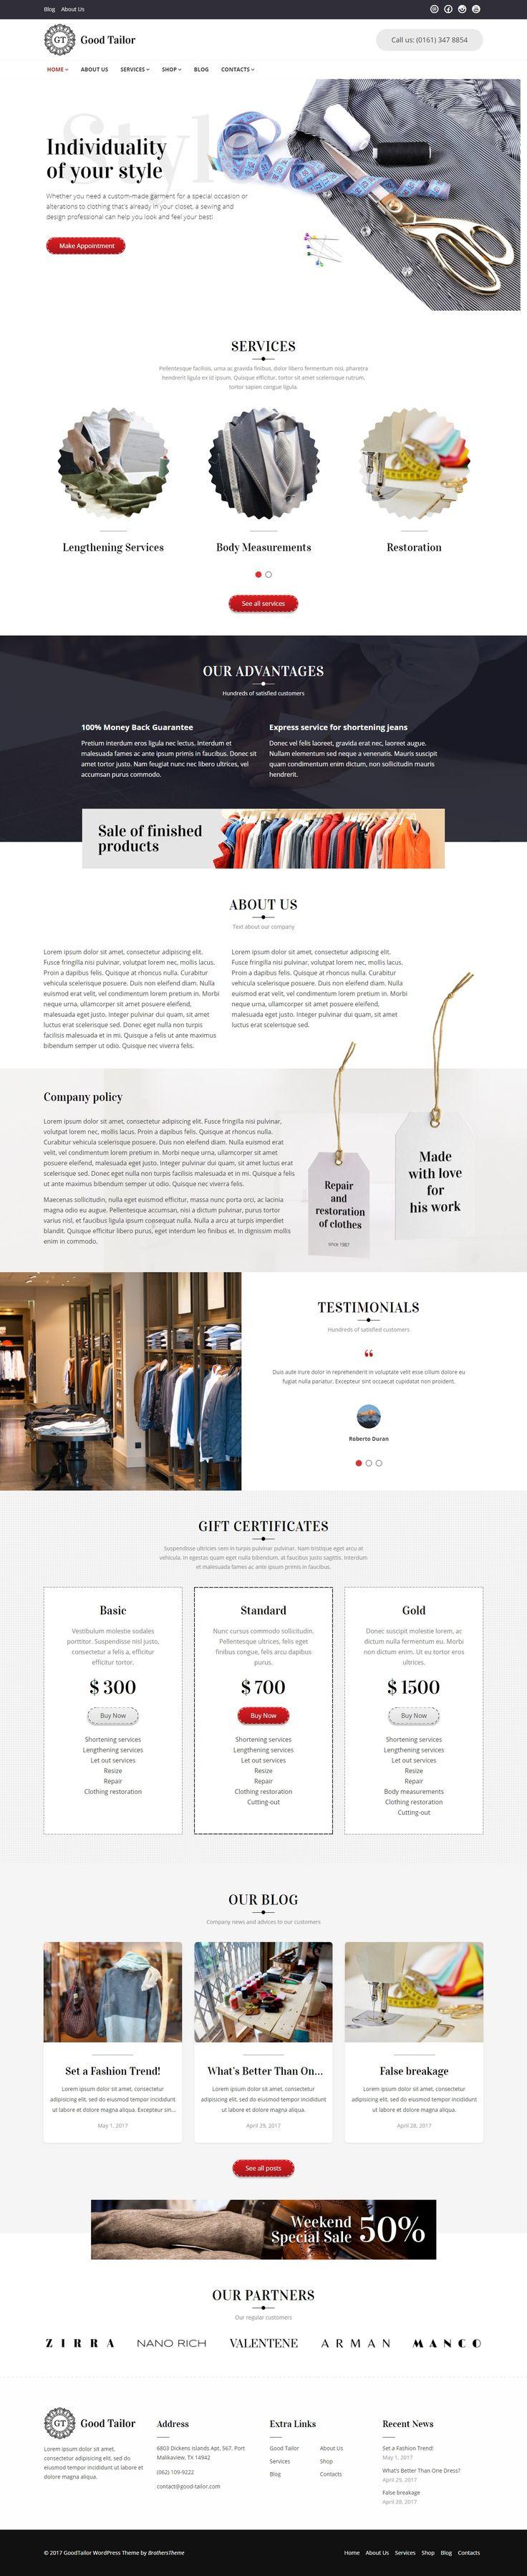 Responsive wordpress theme for tailoring service